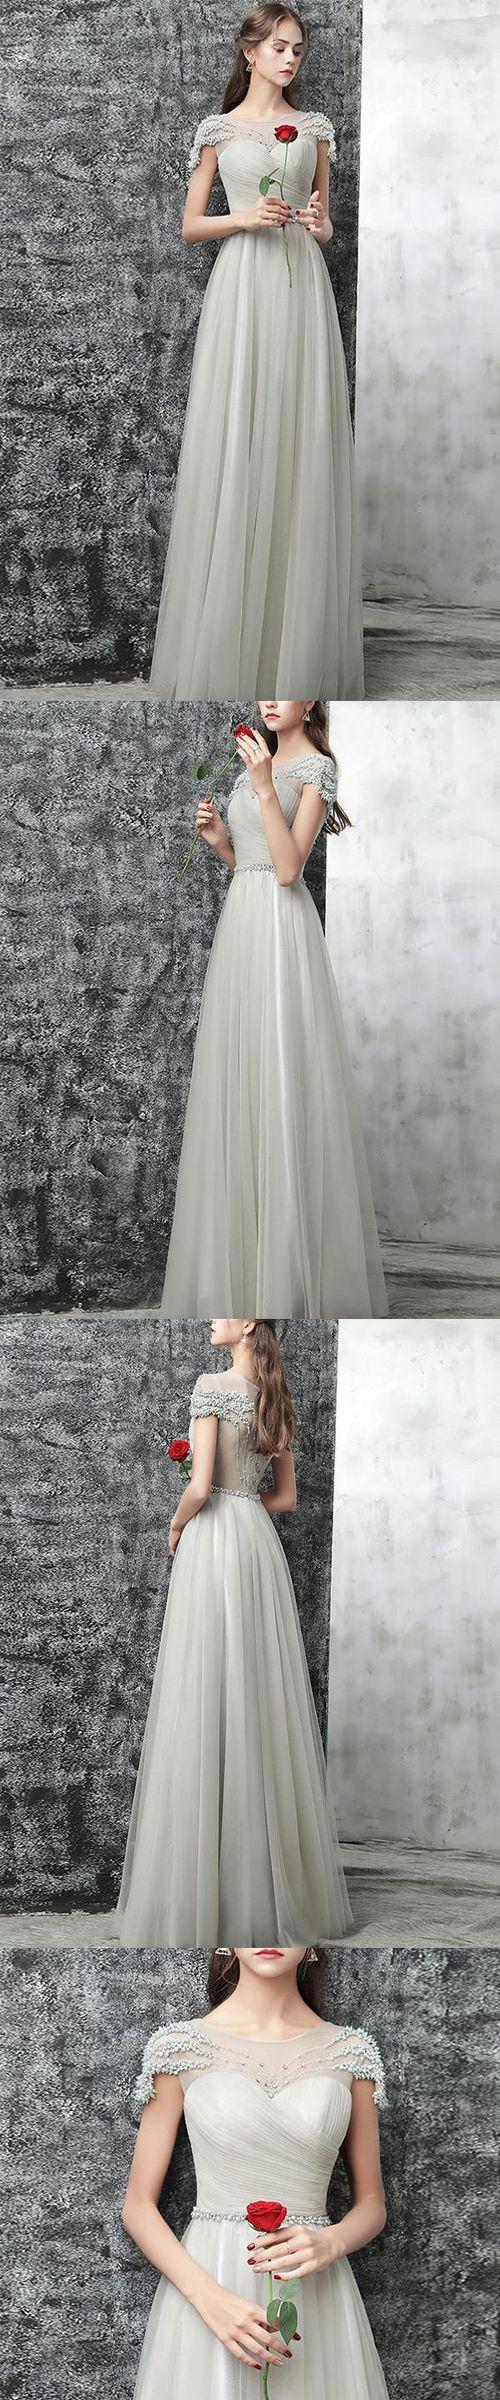 Elegant round neck cap sleeves gray tulle long promevening dresses